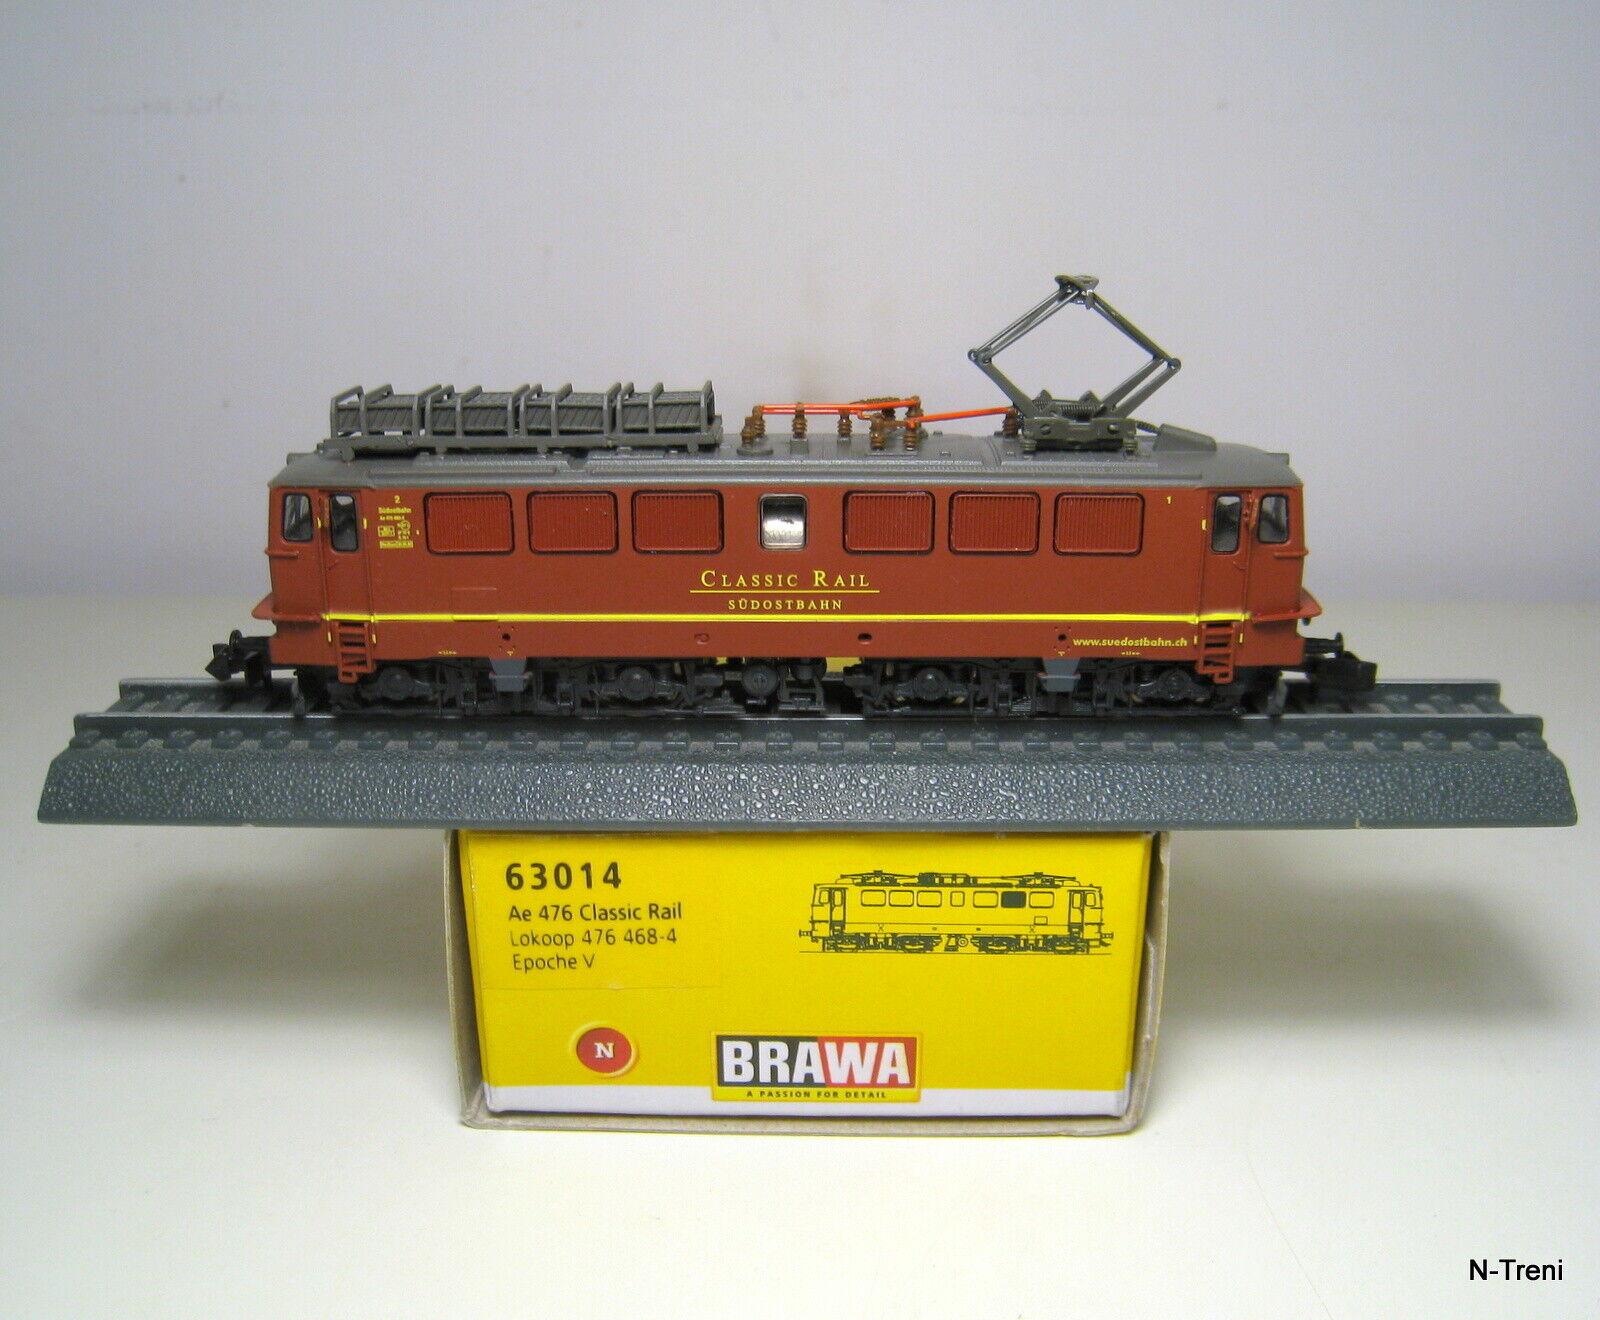 Brawa N 63014 - Loco elettrica Ae 476 Lokoop Classic Rail. Epoca V